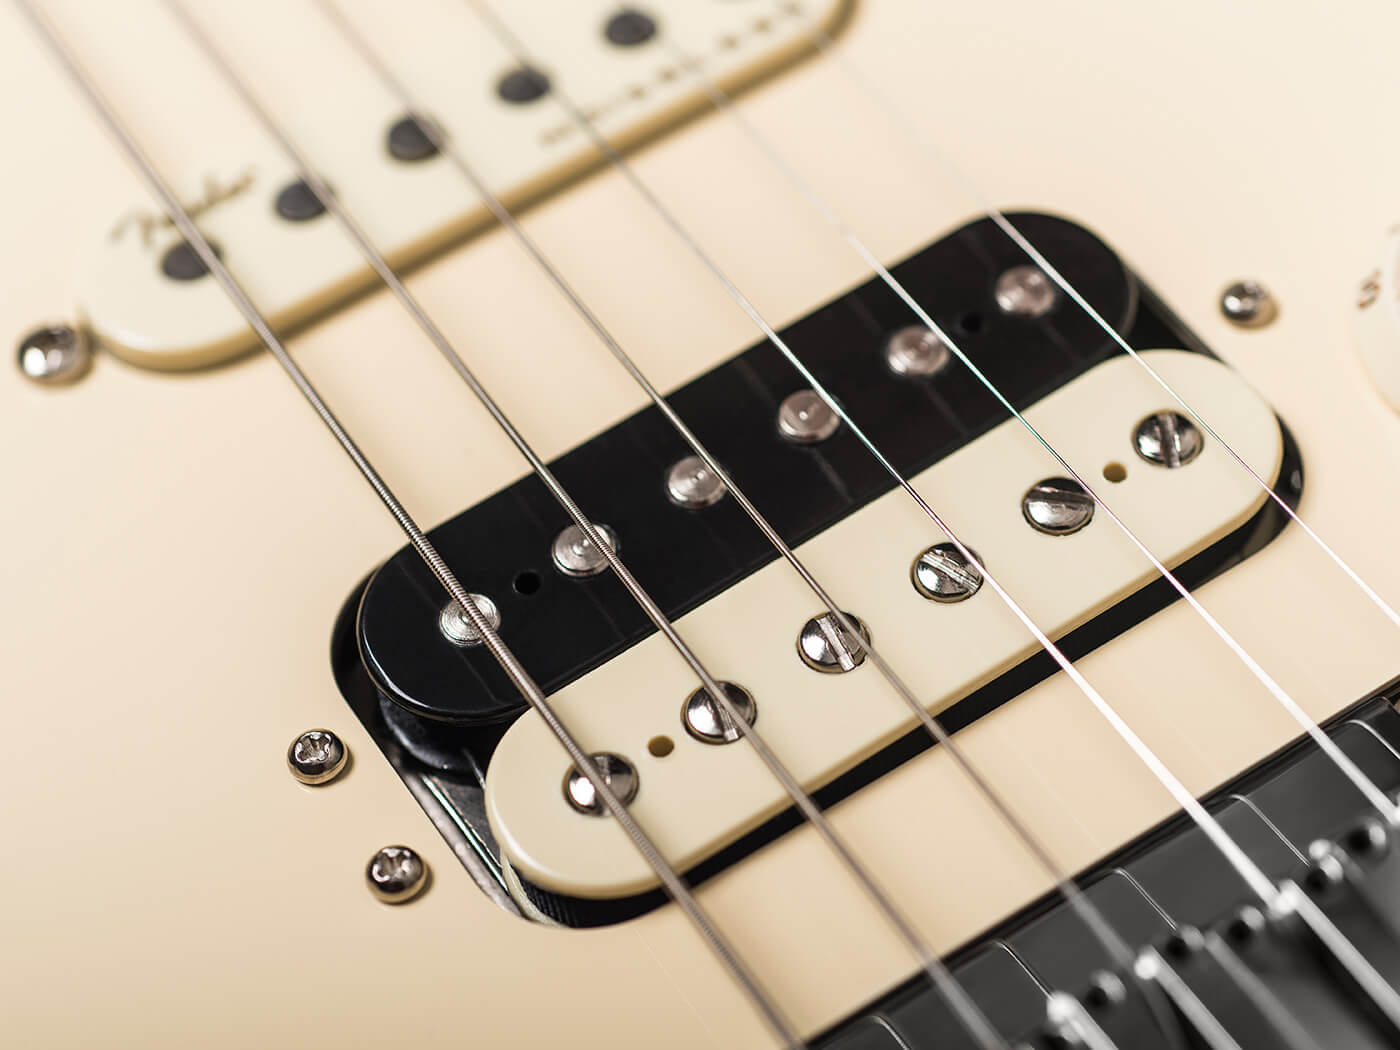 Fender American Ultra Stratocaster (Pickups)